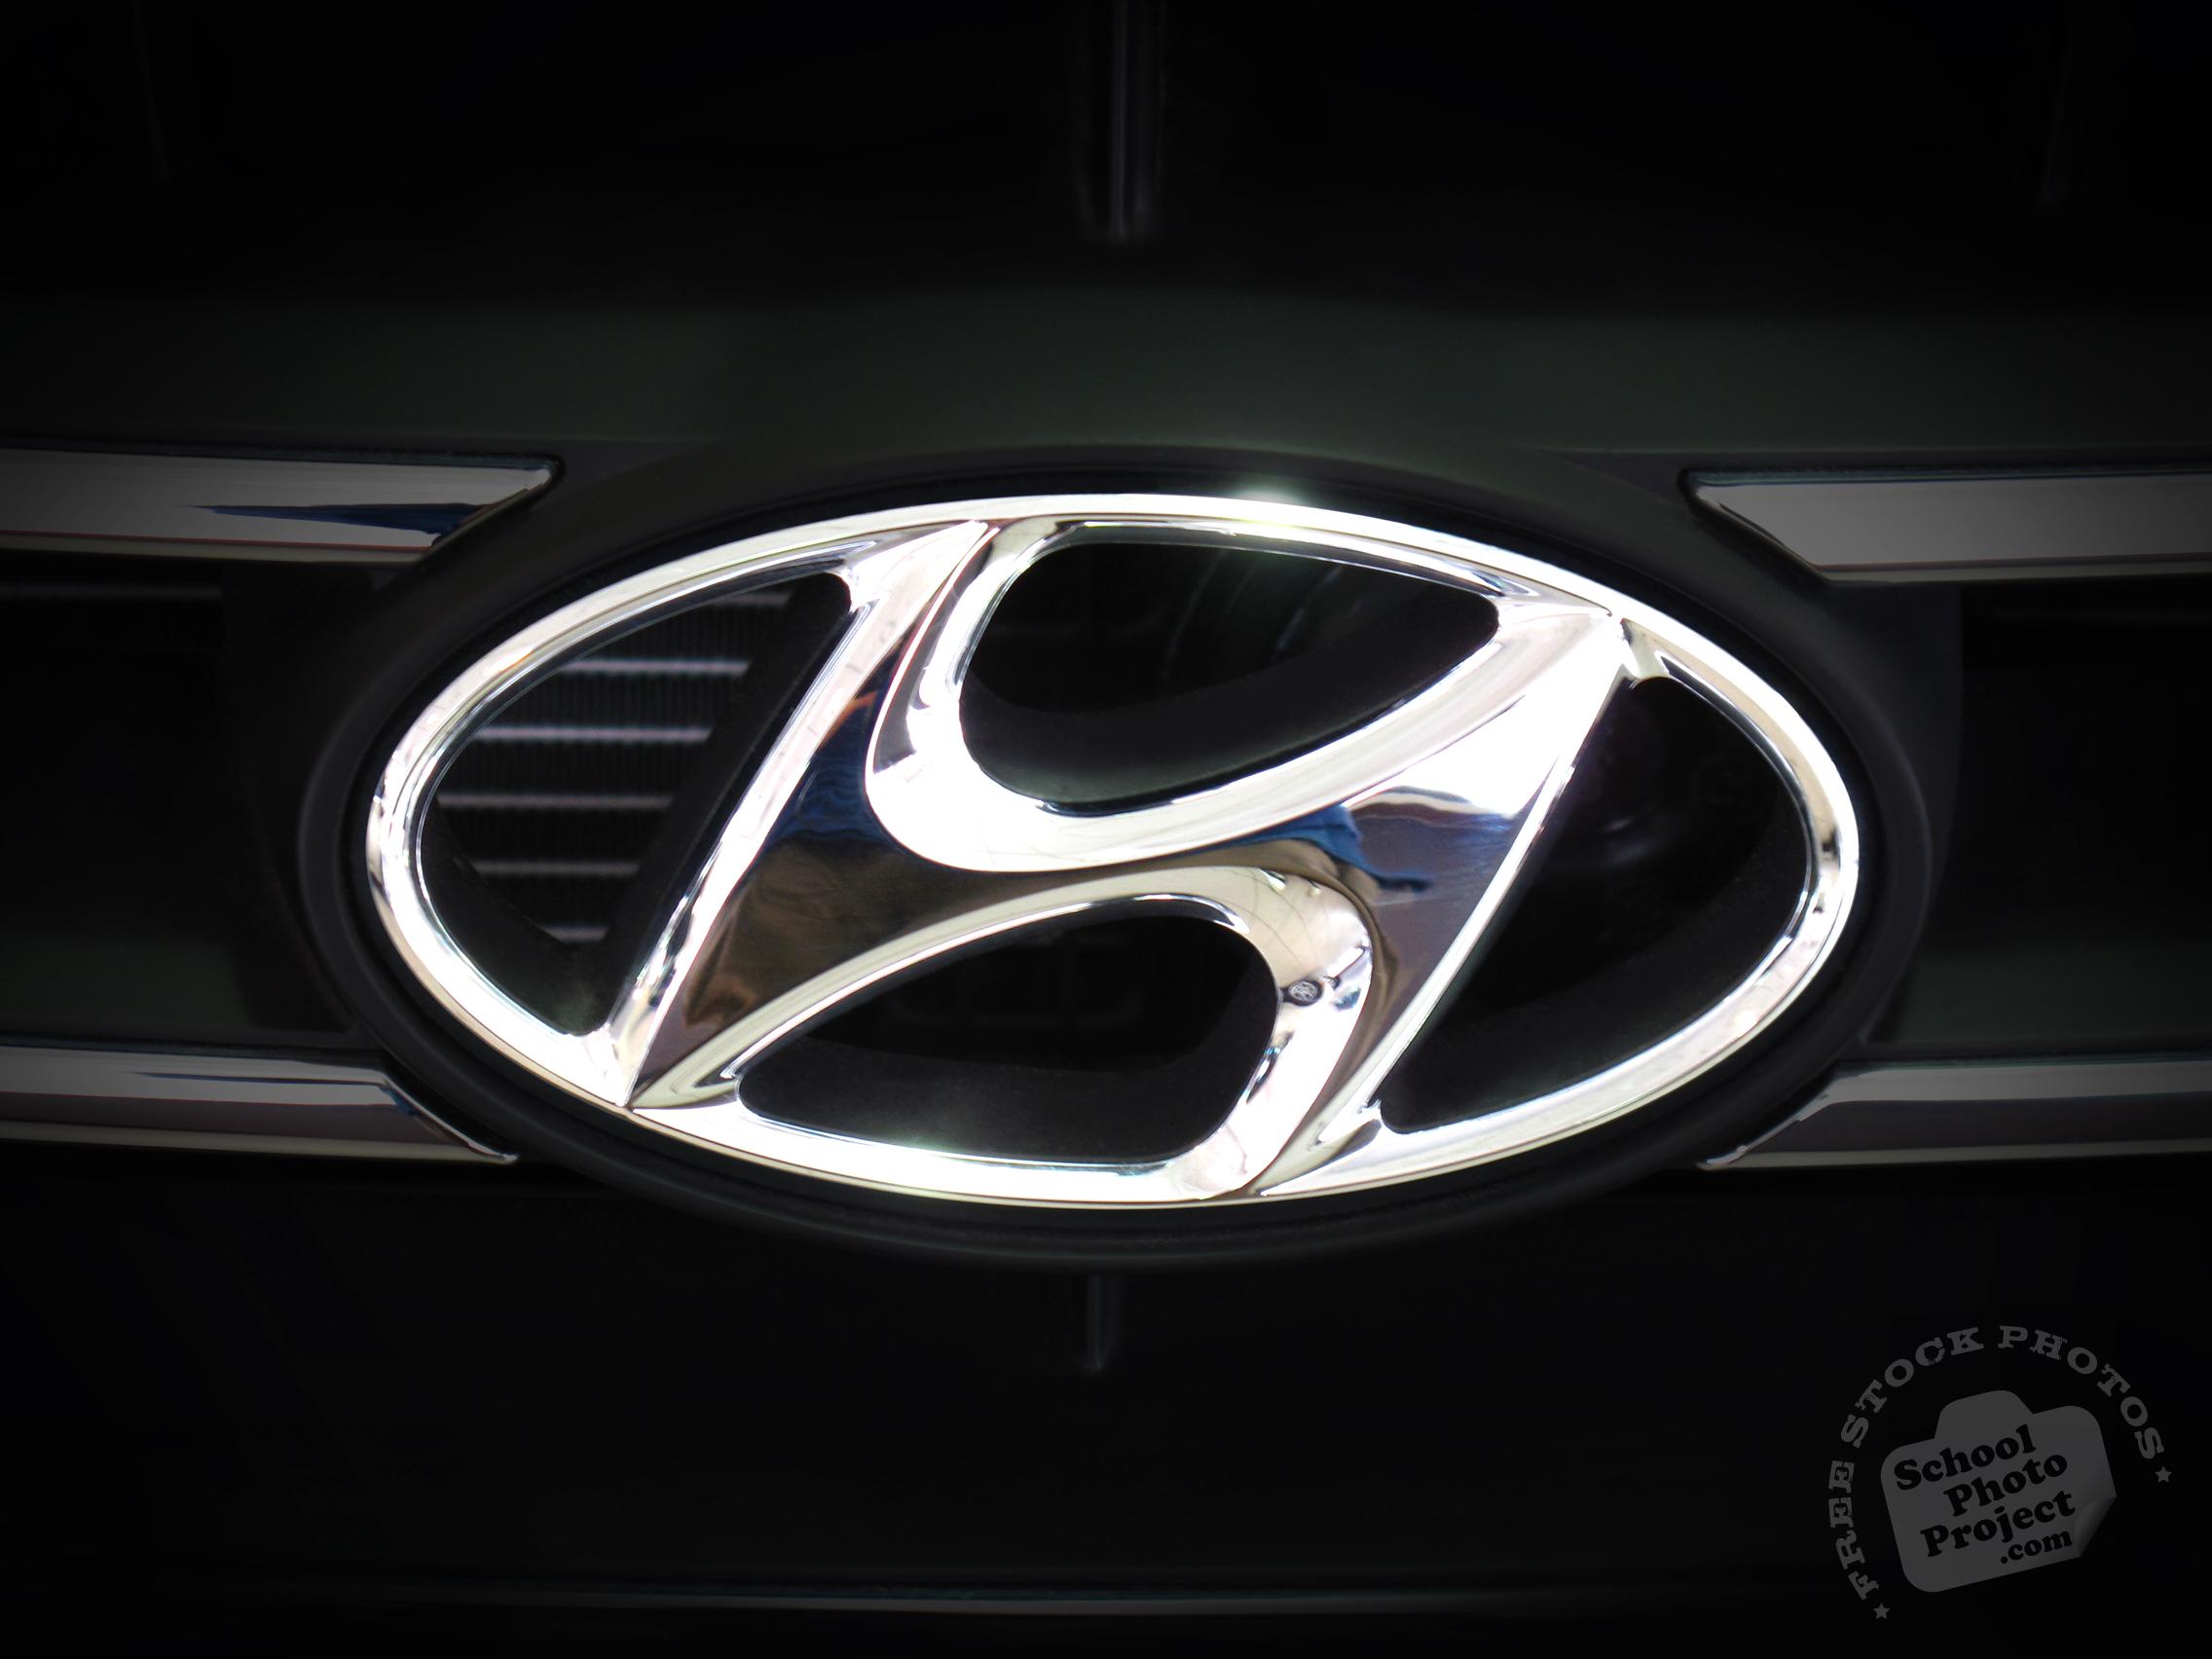 Hyundai Car Logo Wallpaper 3876   Ongur 2272x1704